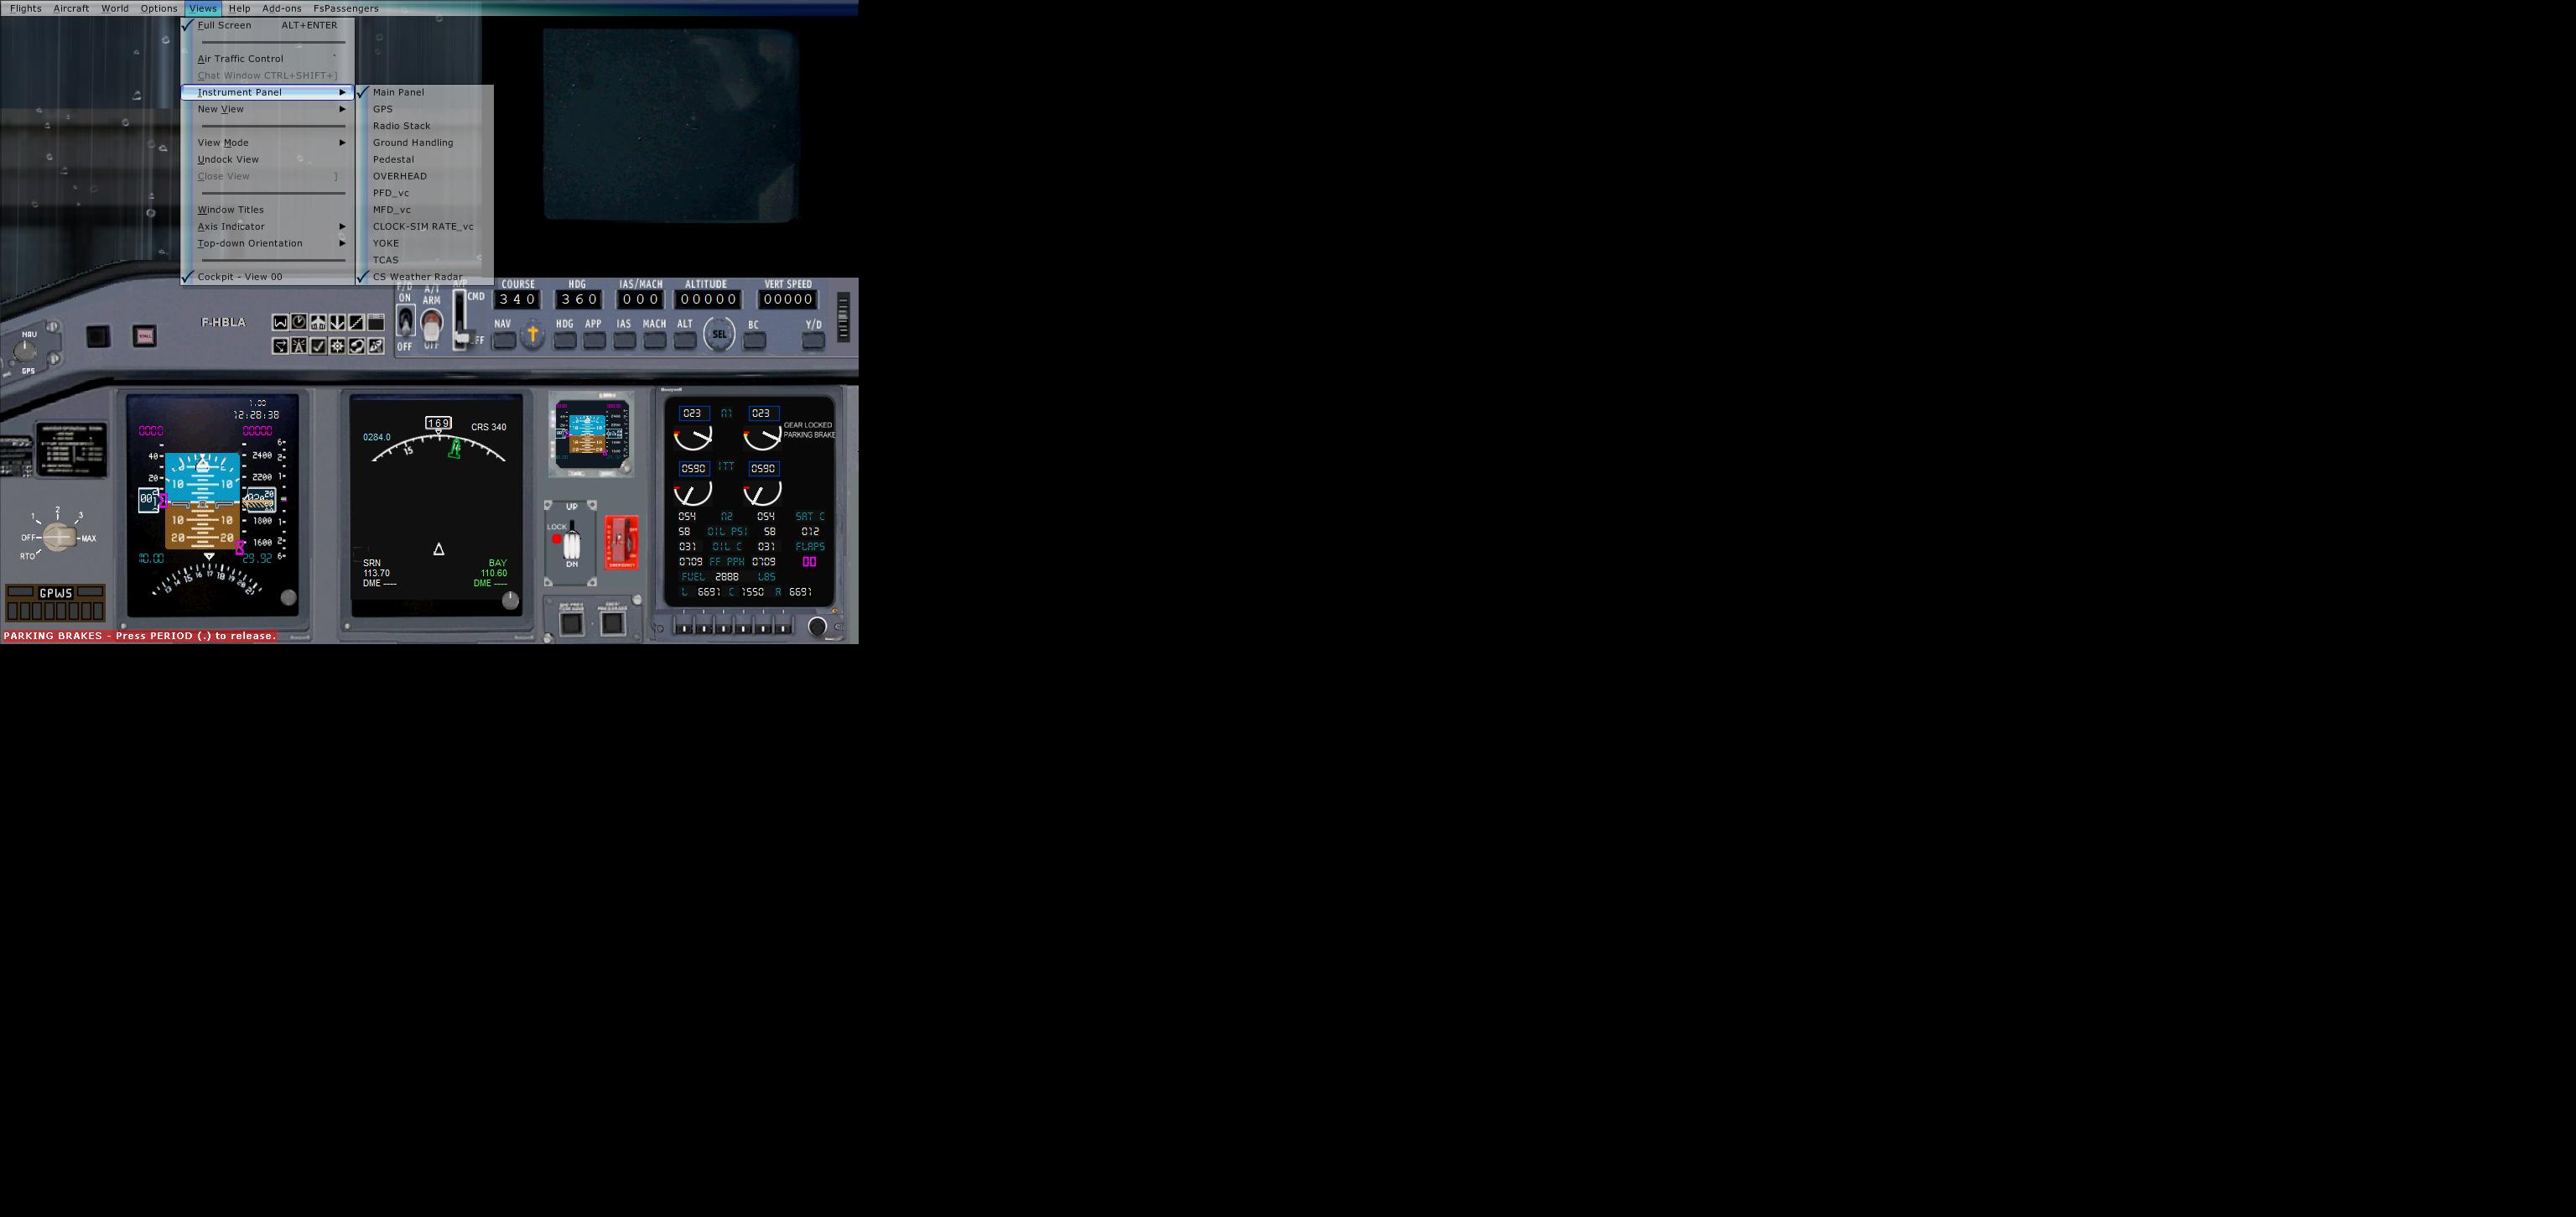 Radar_black.png